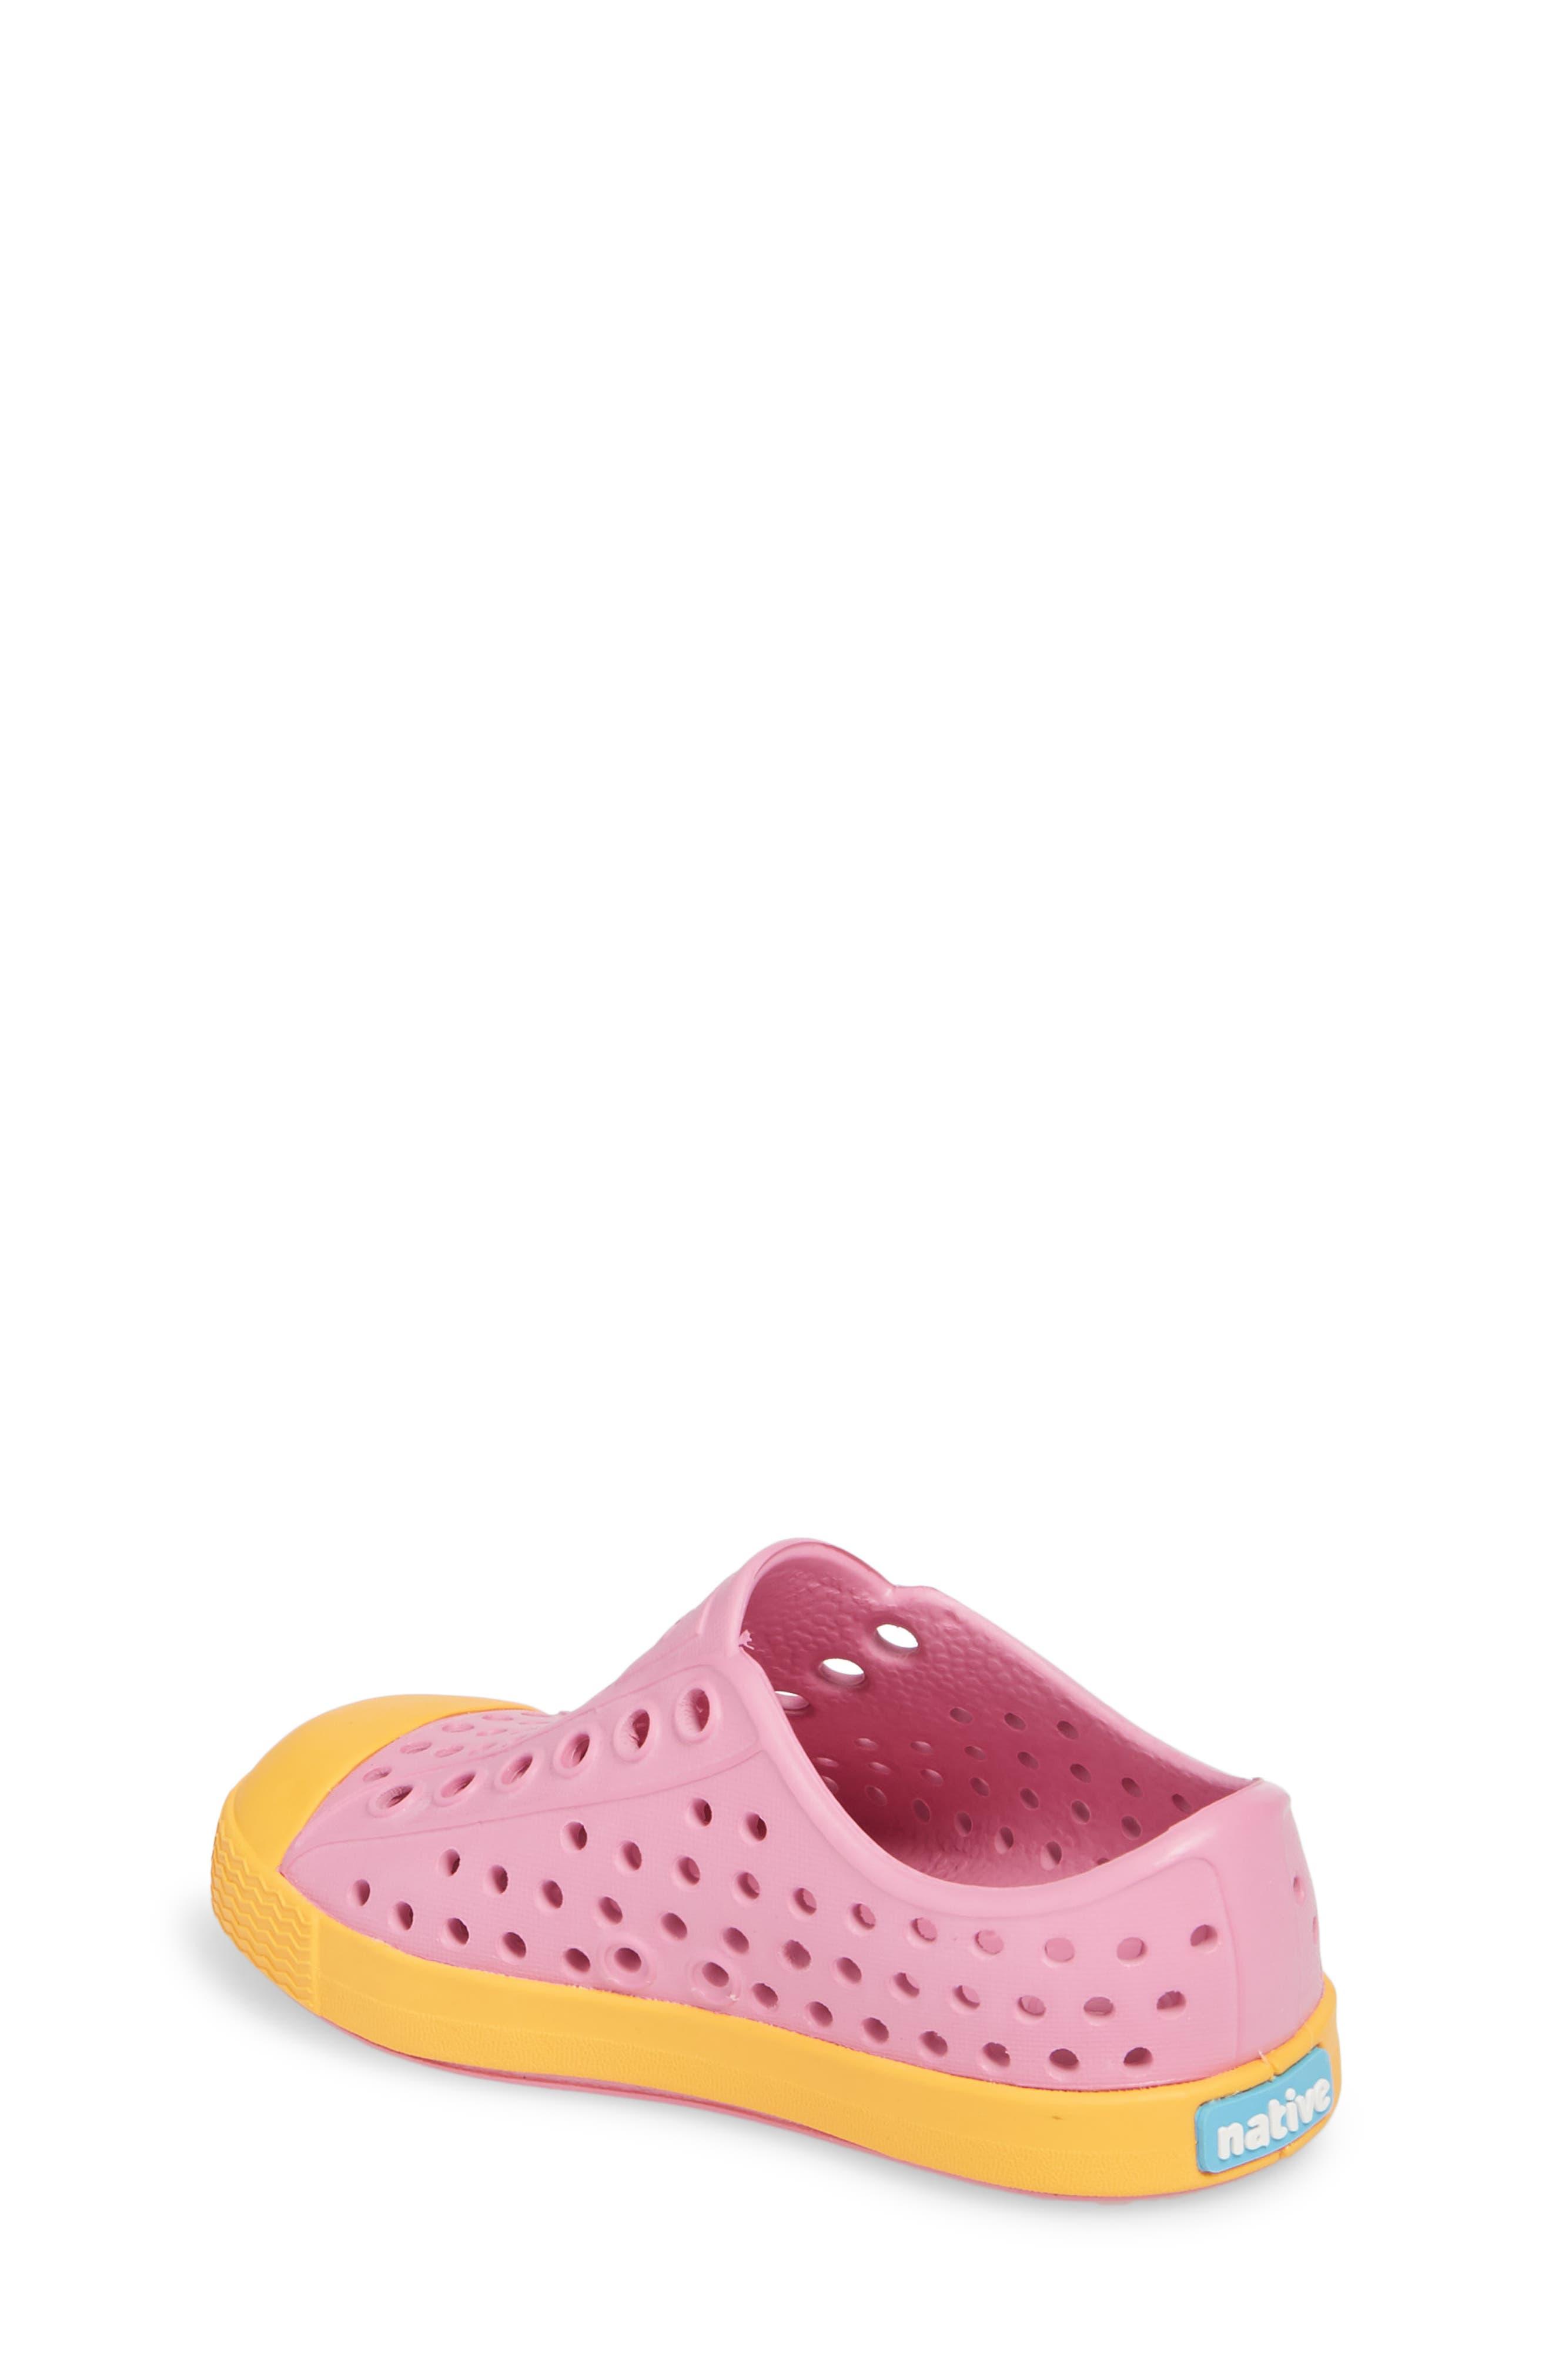 'Jefferson' Water Friendly Slip-On Sneaker,                             Alternate thumbnail 80, color,